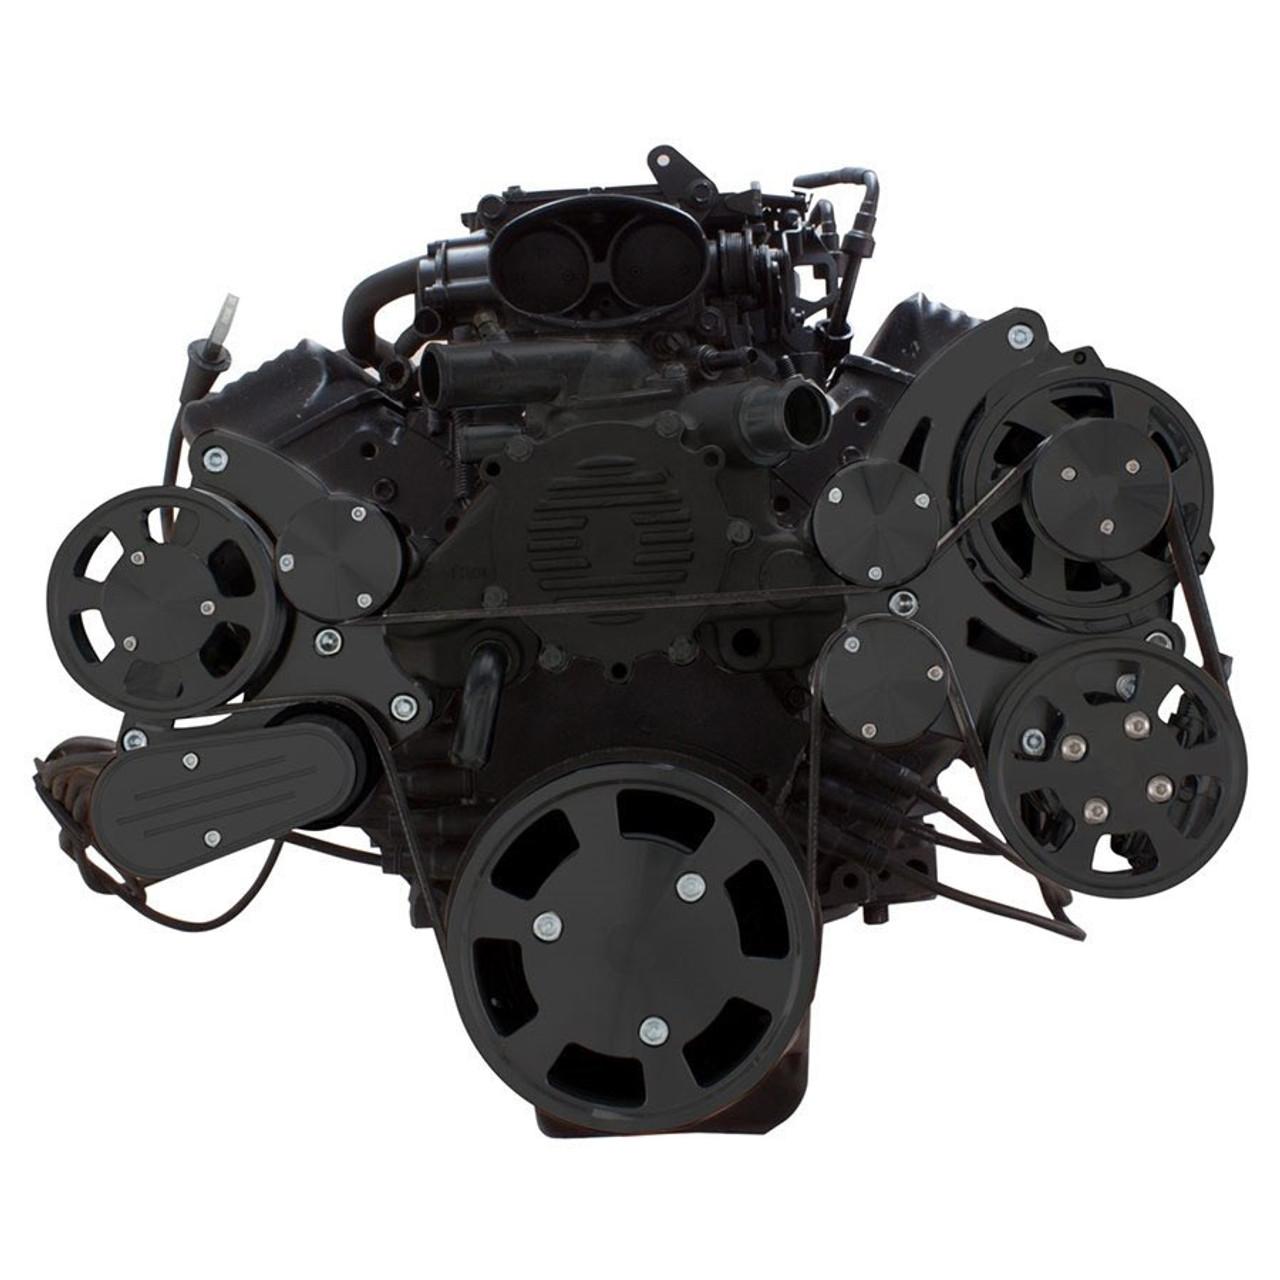 C1 Corvette Hydroboost